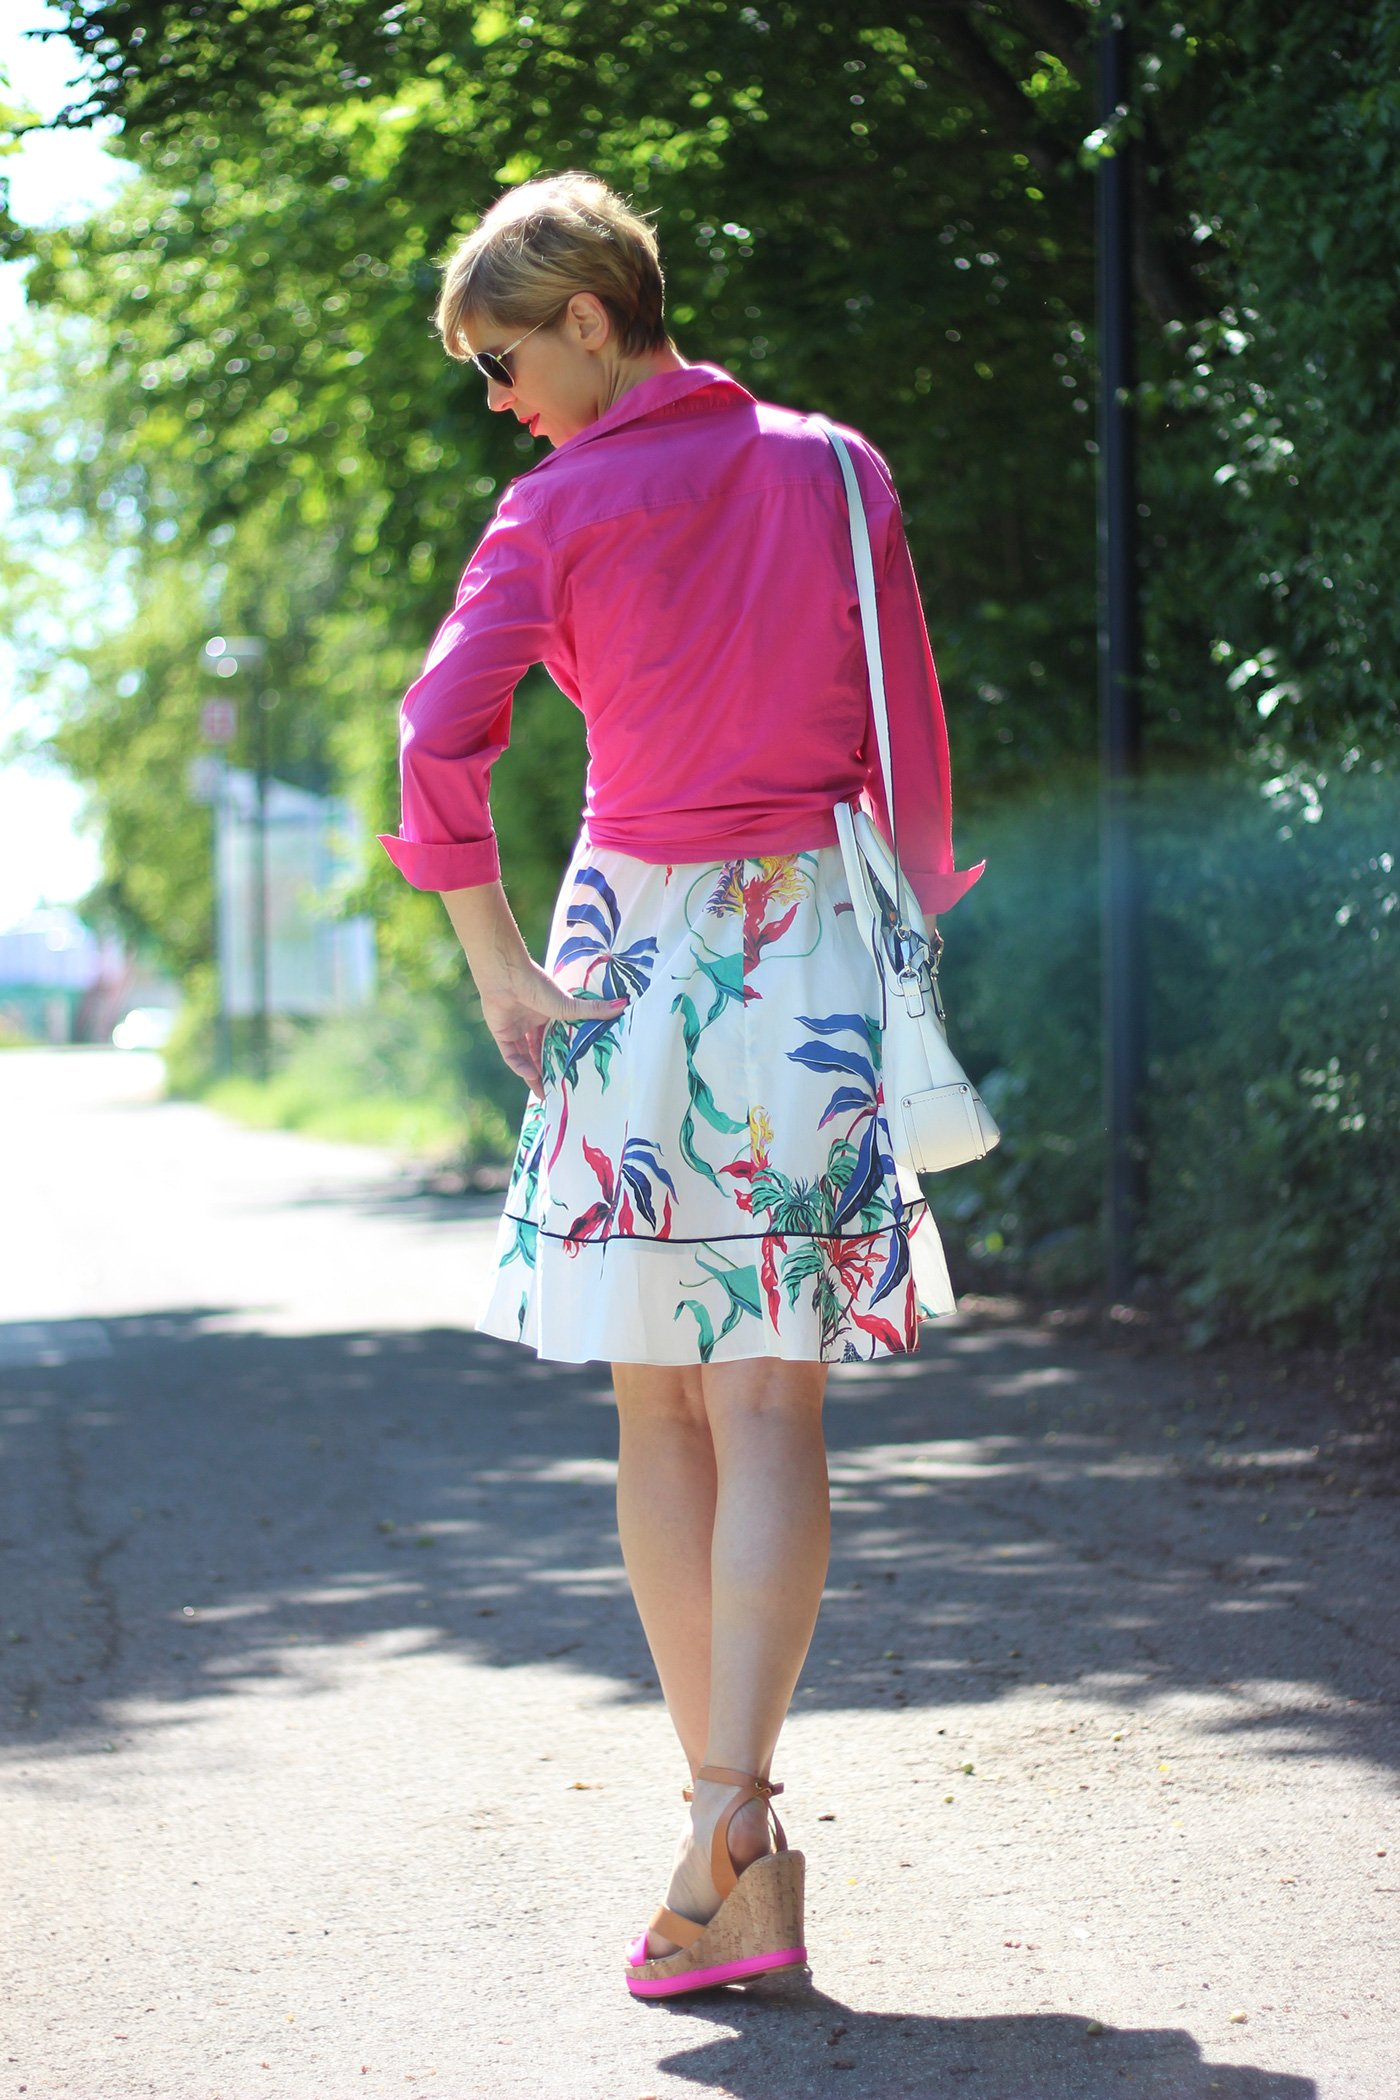 IMG_5921a_Blumenkleid_Flower_Dress_ConnyDoll_AHemadundaHos_Sommerkleid_summerdress